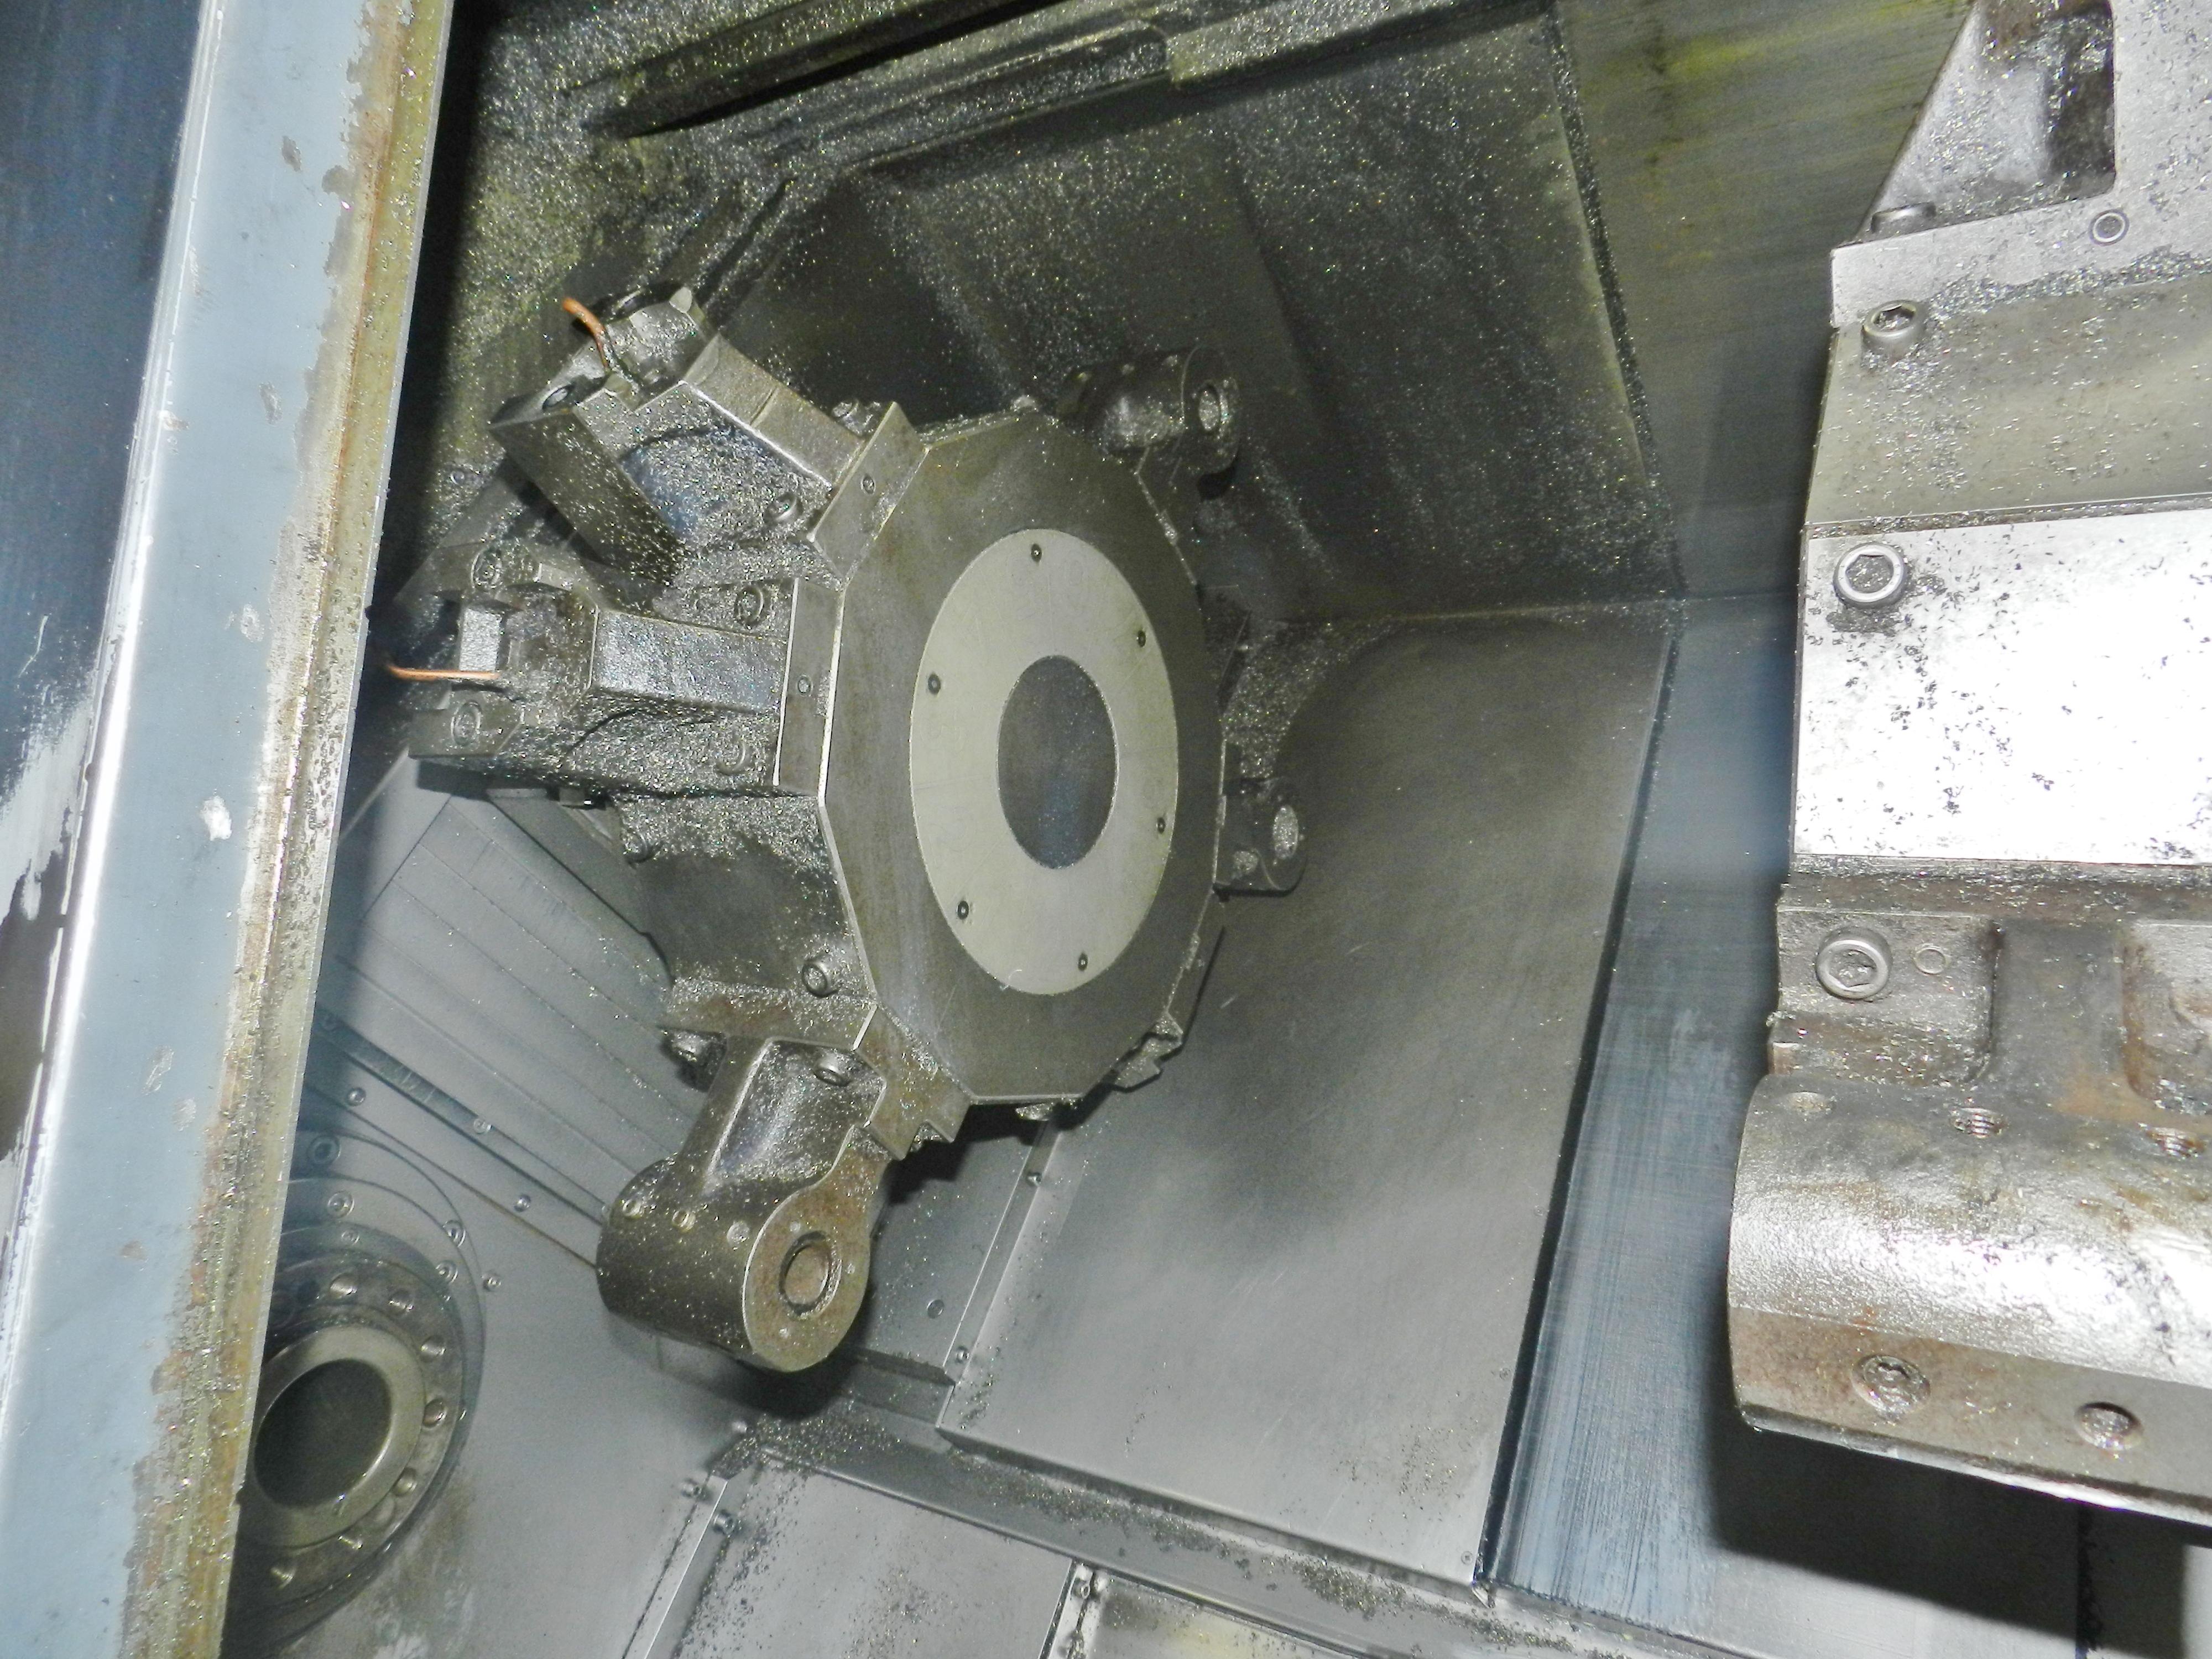 Mori Seiki DL-20 CNC Lathe - Image 5 of 12